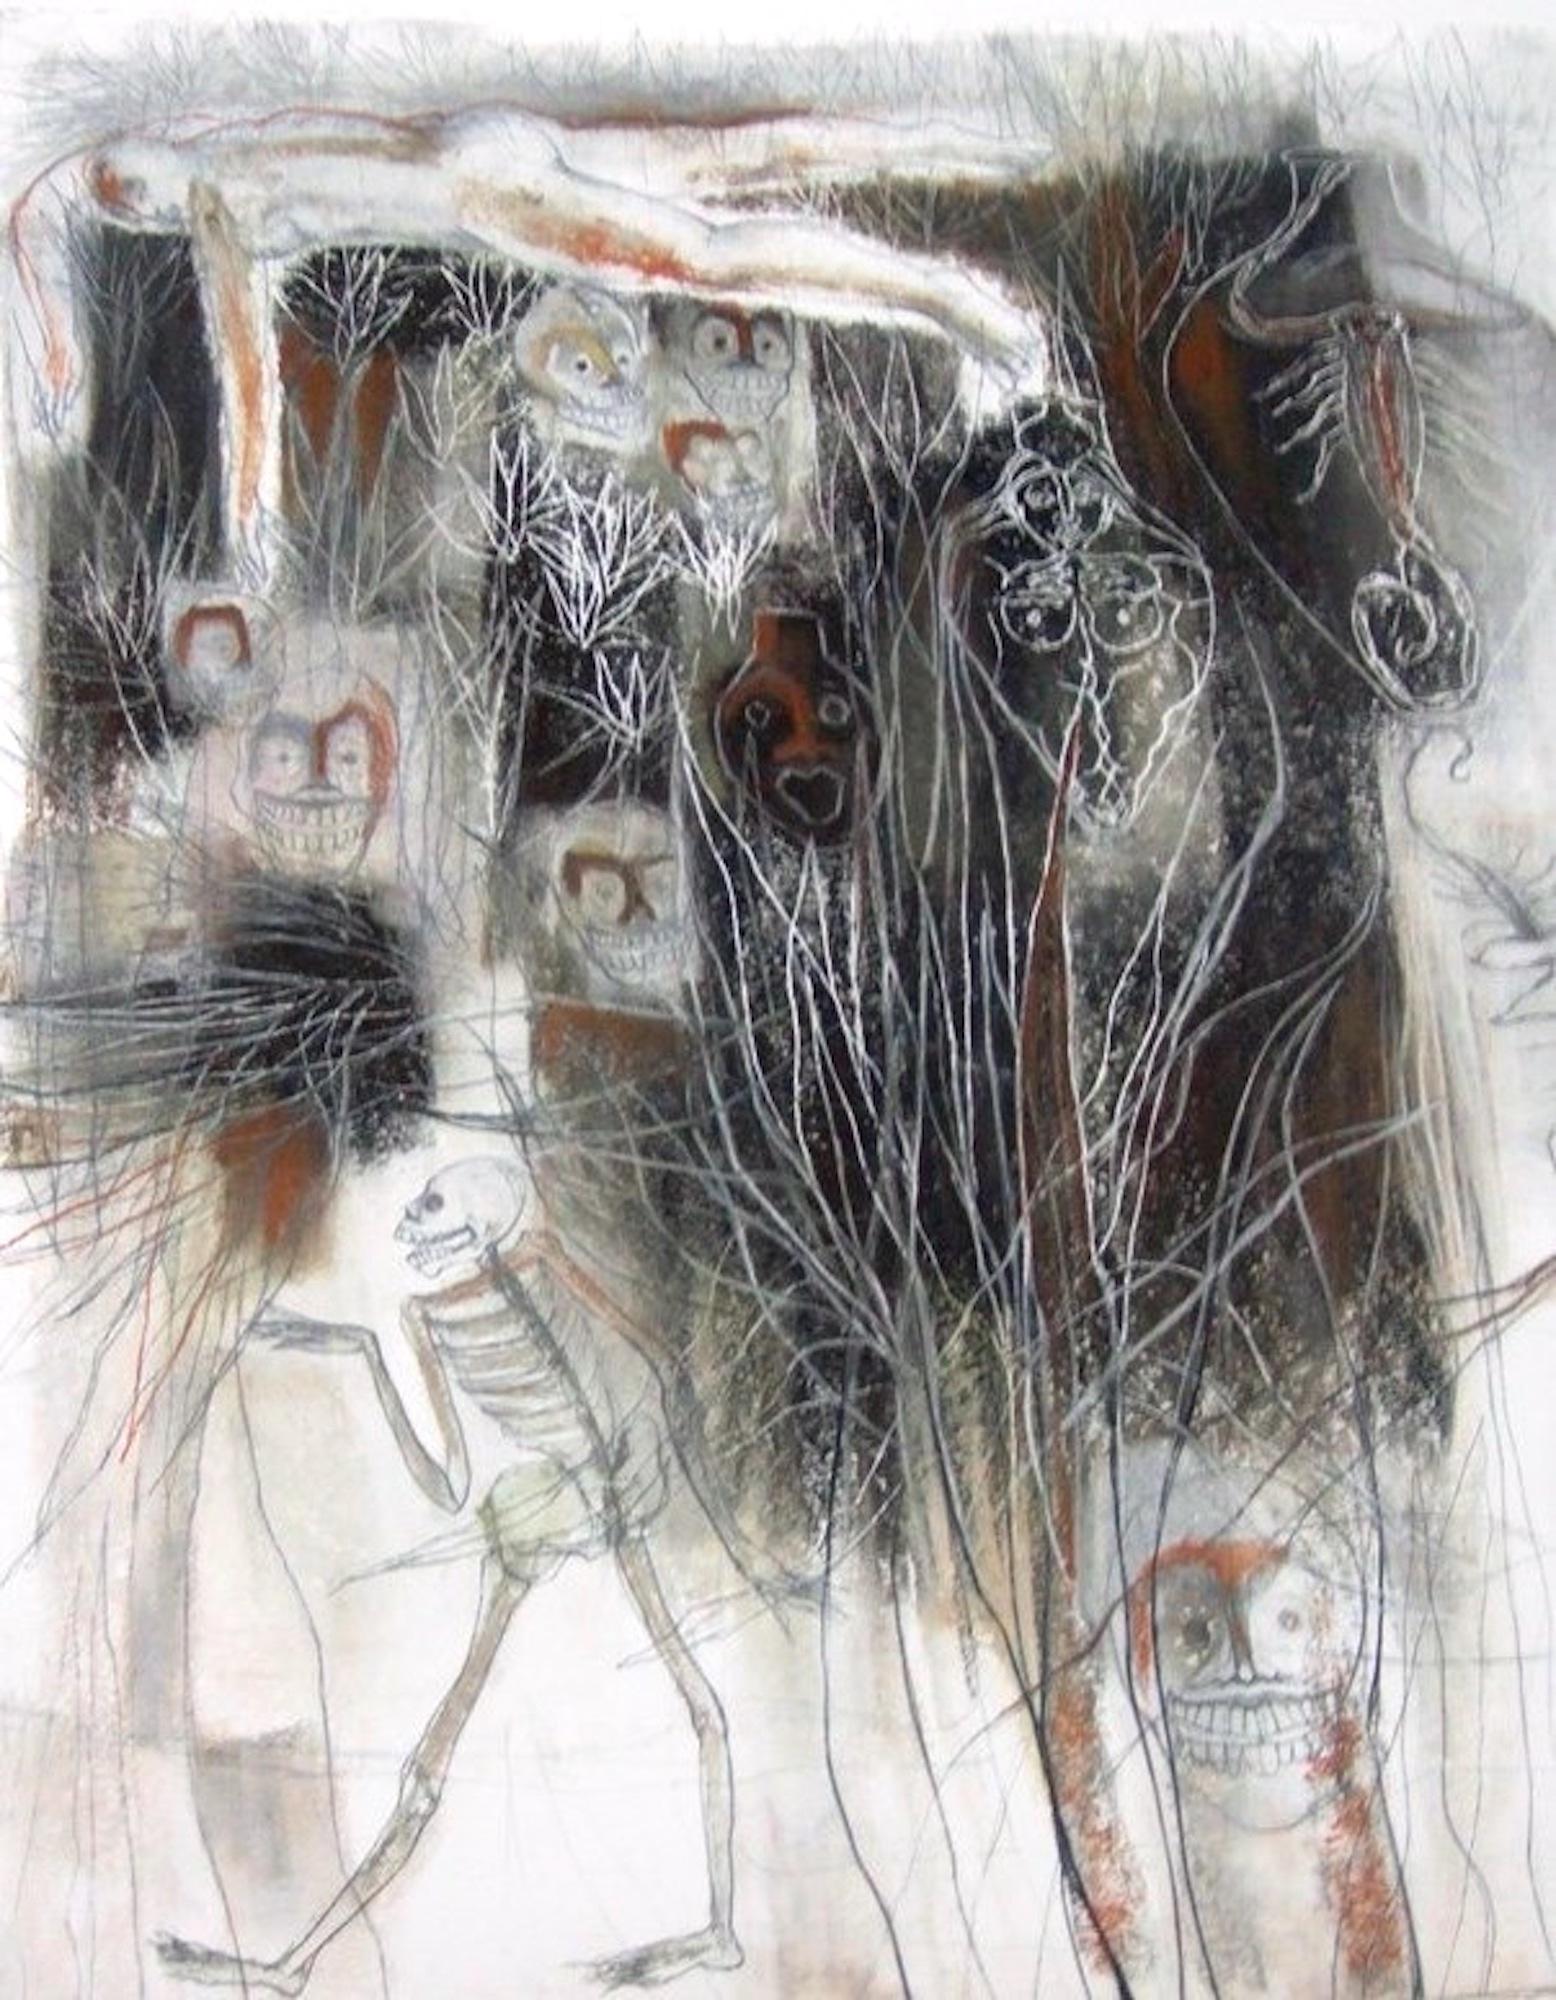 Magueyes V con calaca. Mixta sobre papel Stonehenge esgrafiado, 76X57cm.JPG